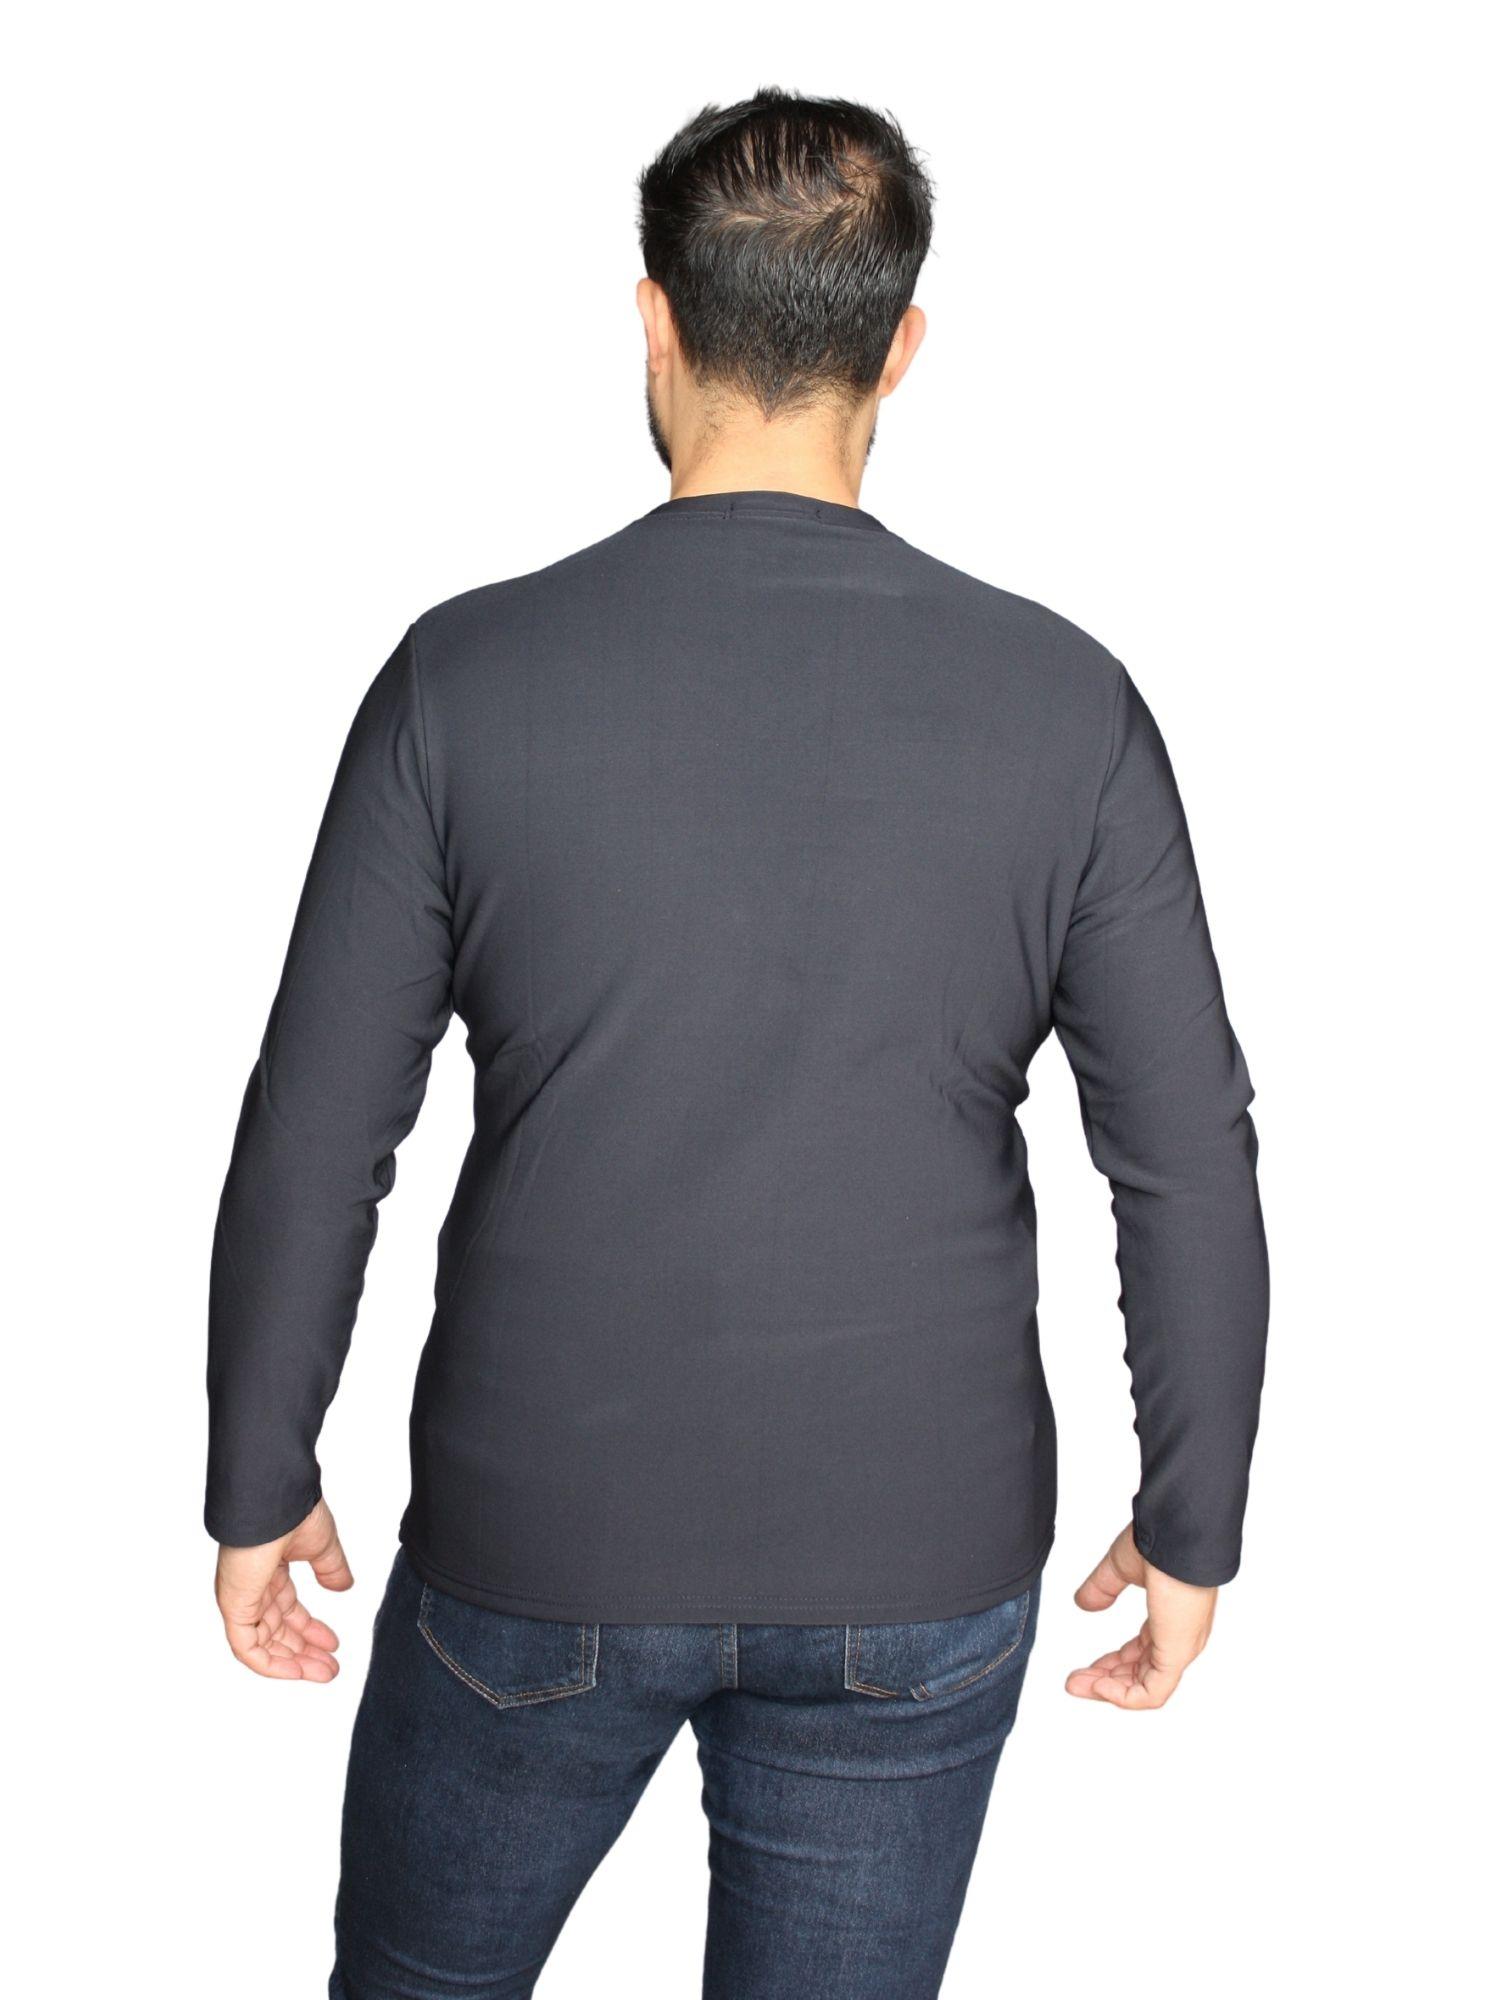 Camiseta Termica Peluciada Facinelli  550070